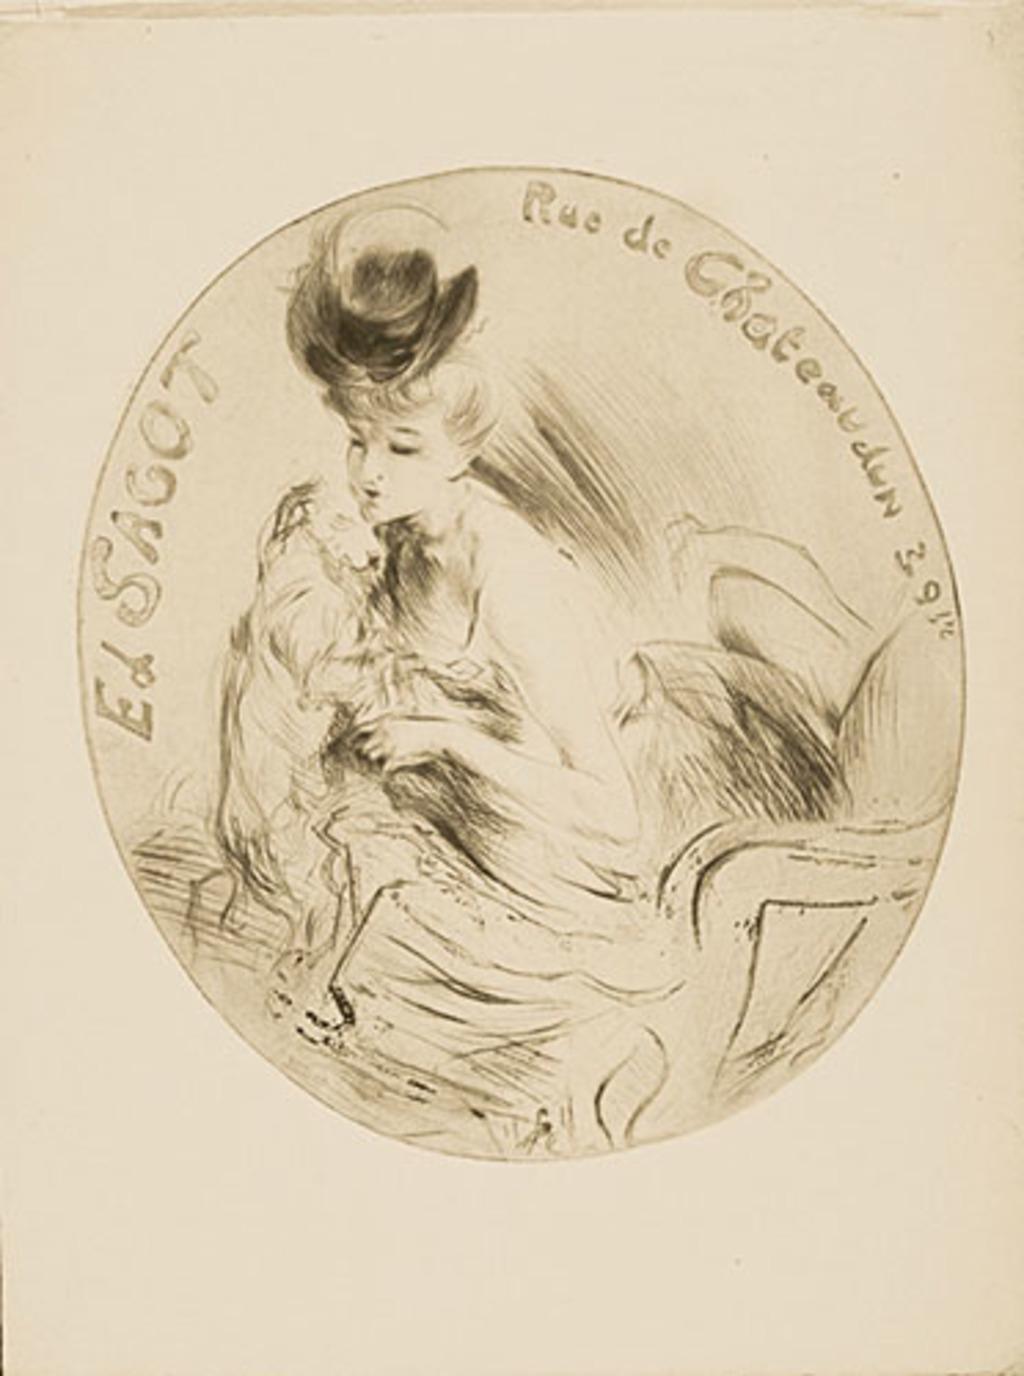 Adresse Sagot 1906 ou La Dame au chien